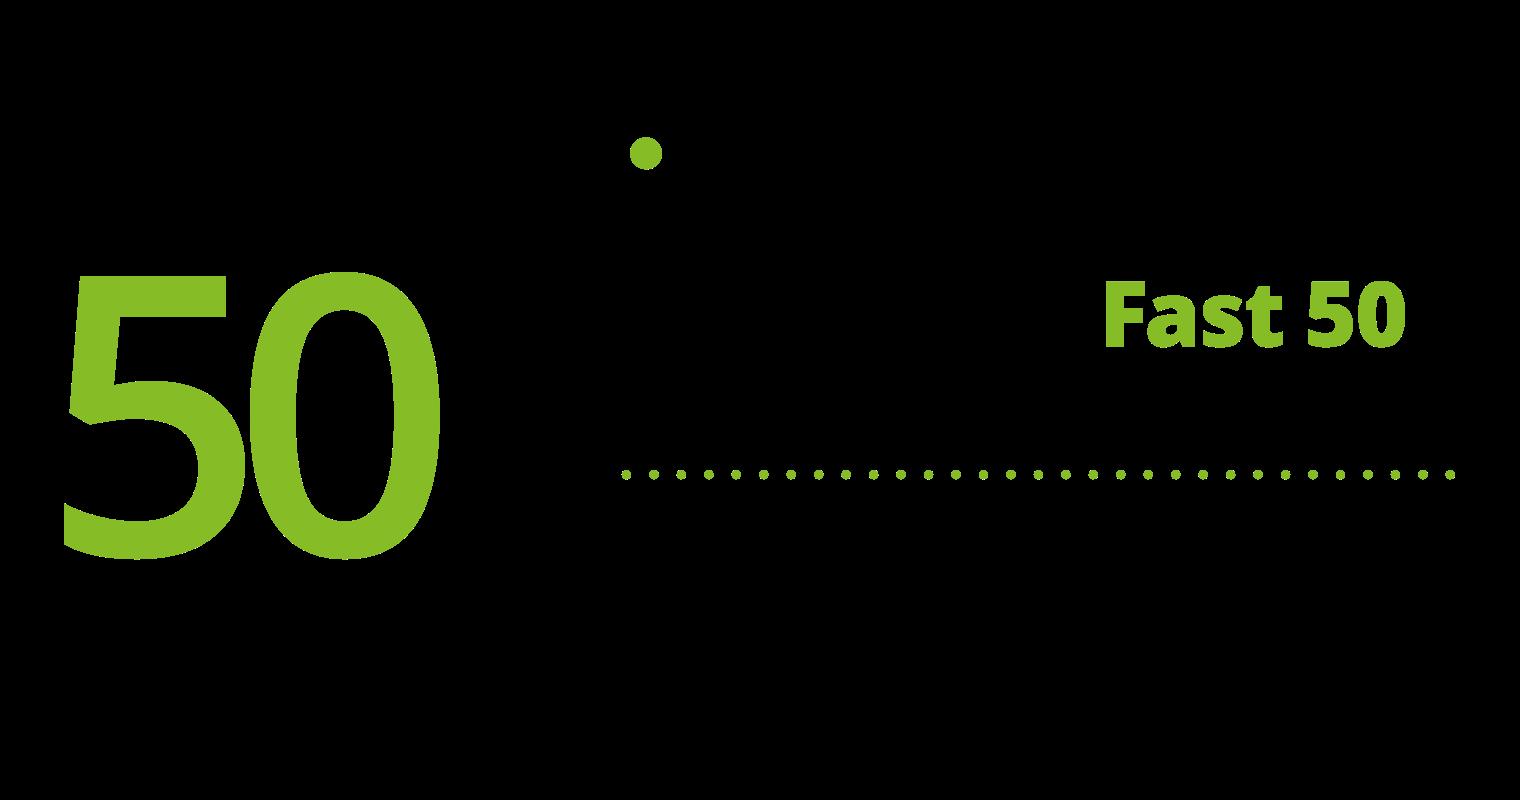 Deloitte. Technology Fast 50 2020 Australia